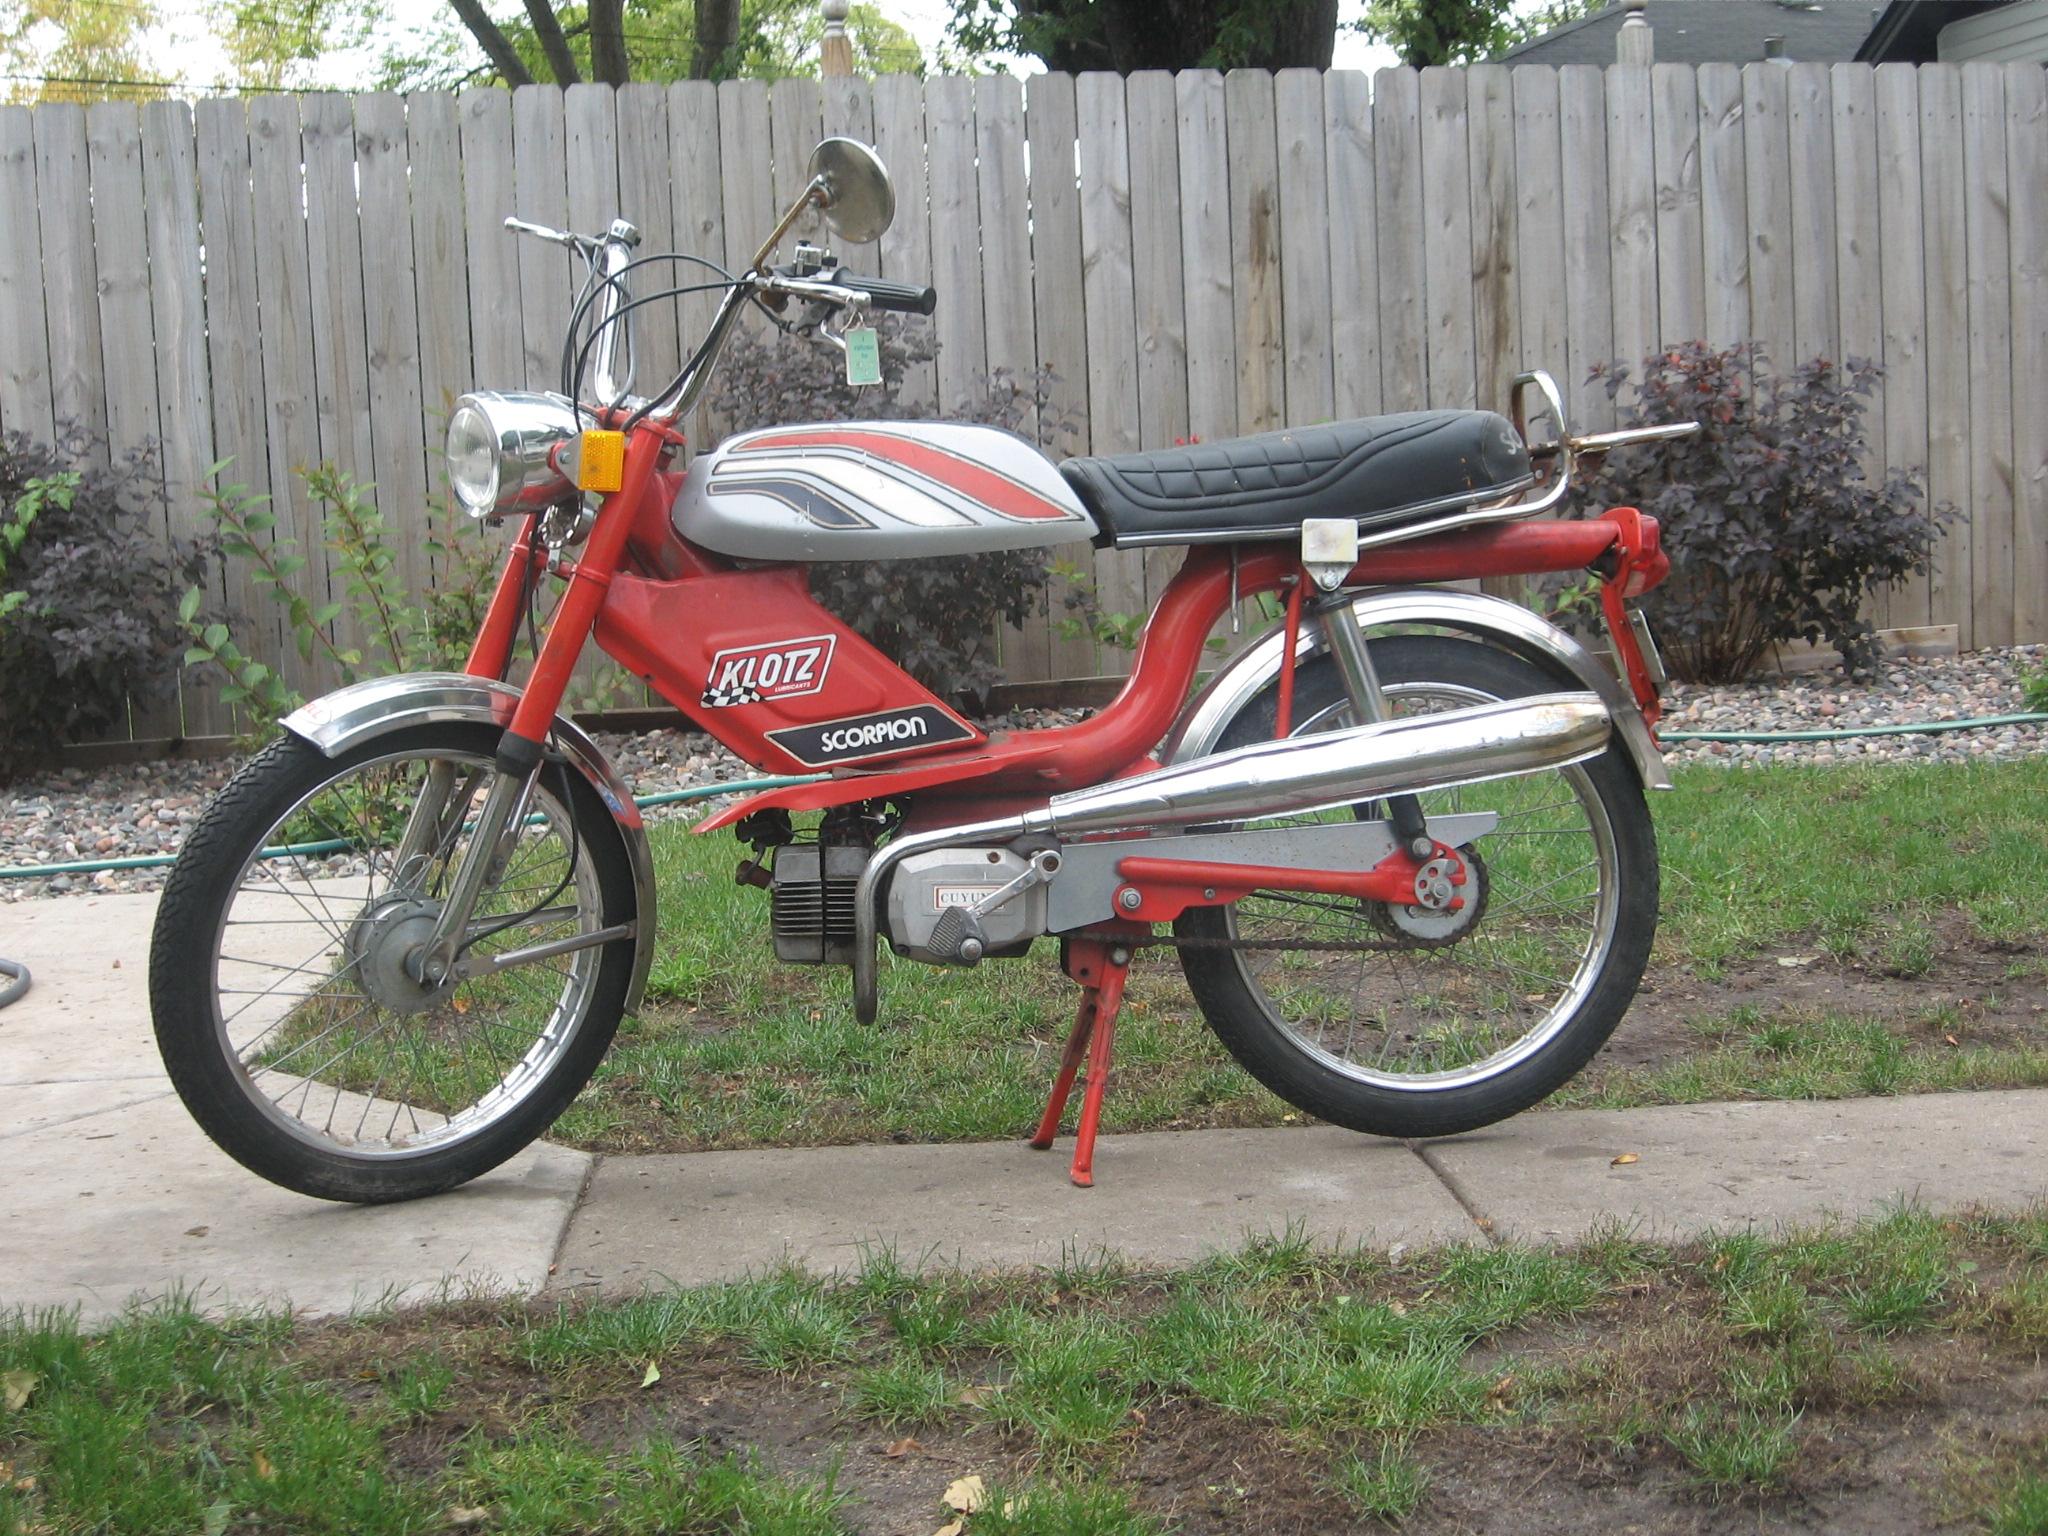 1978 Scorpion Scrambler Moped Army